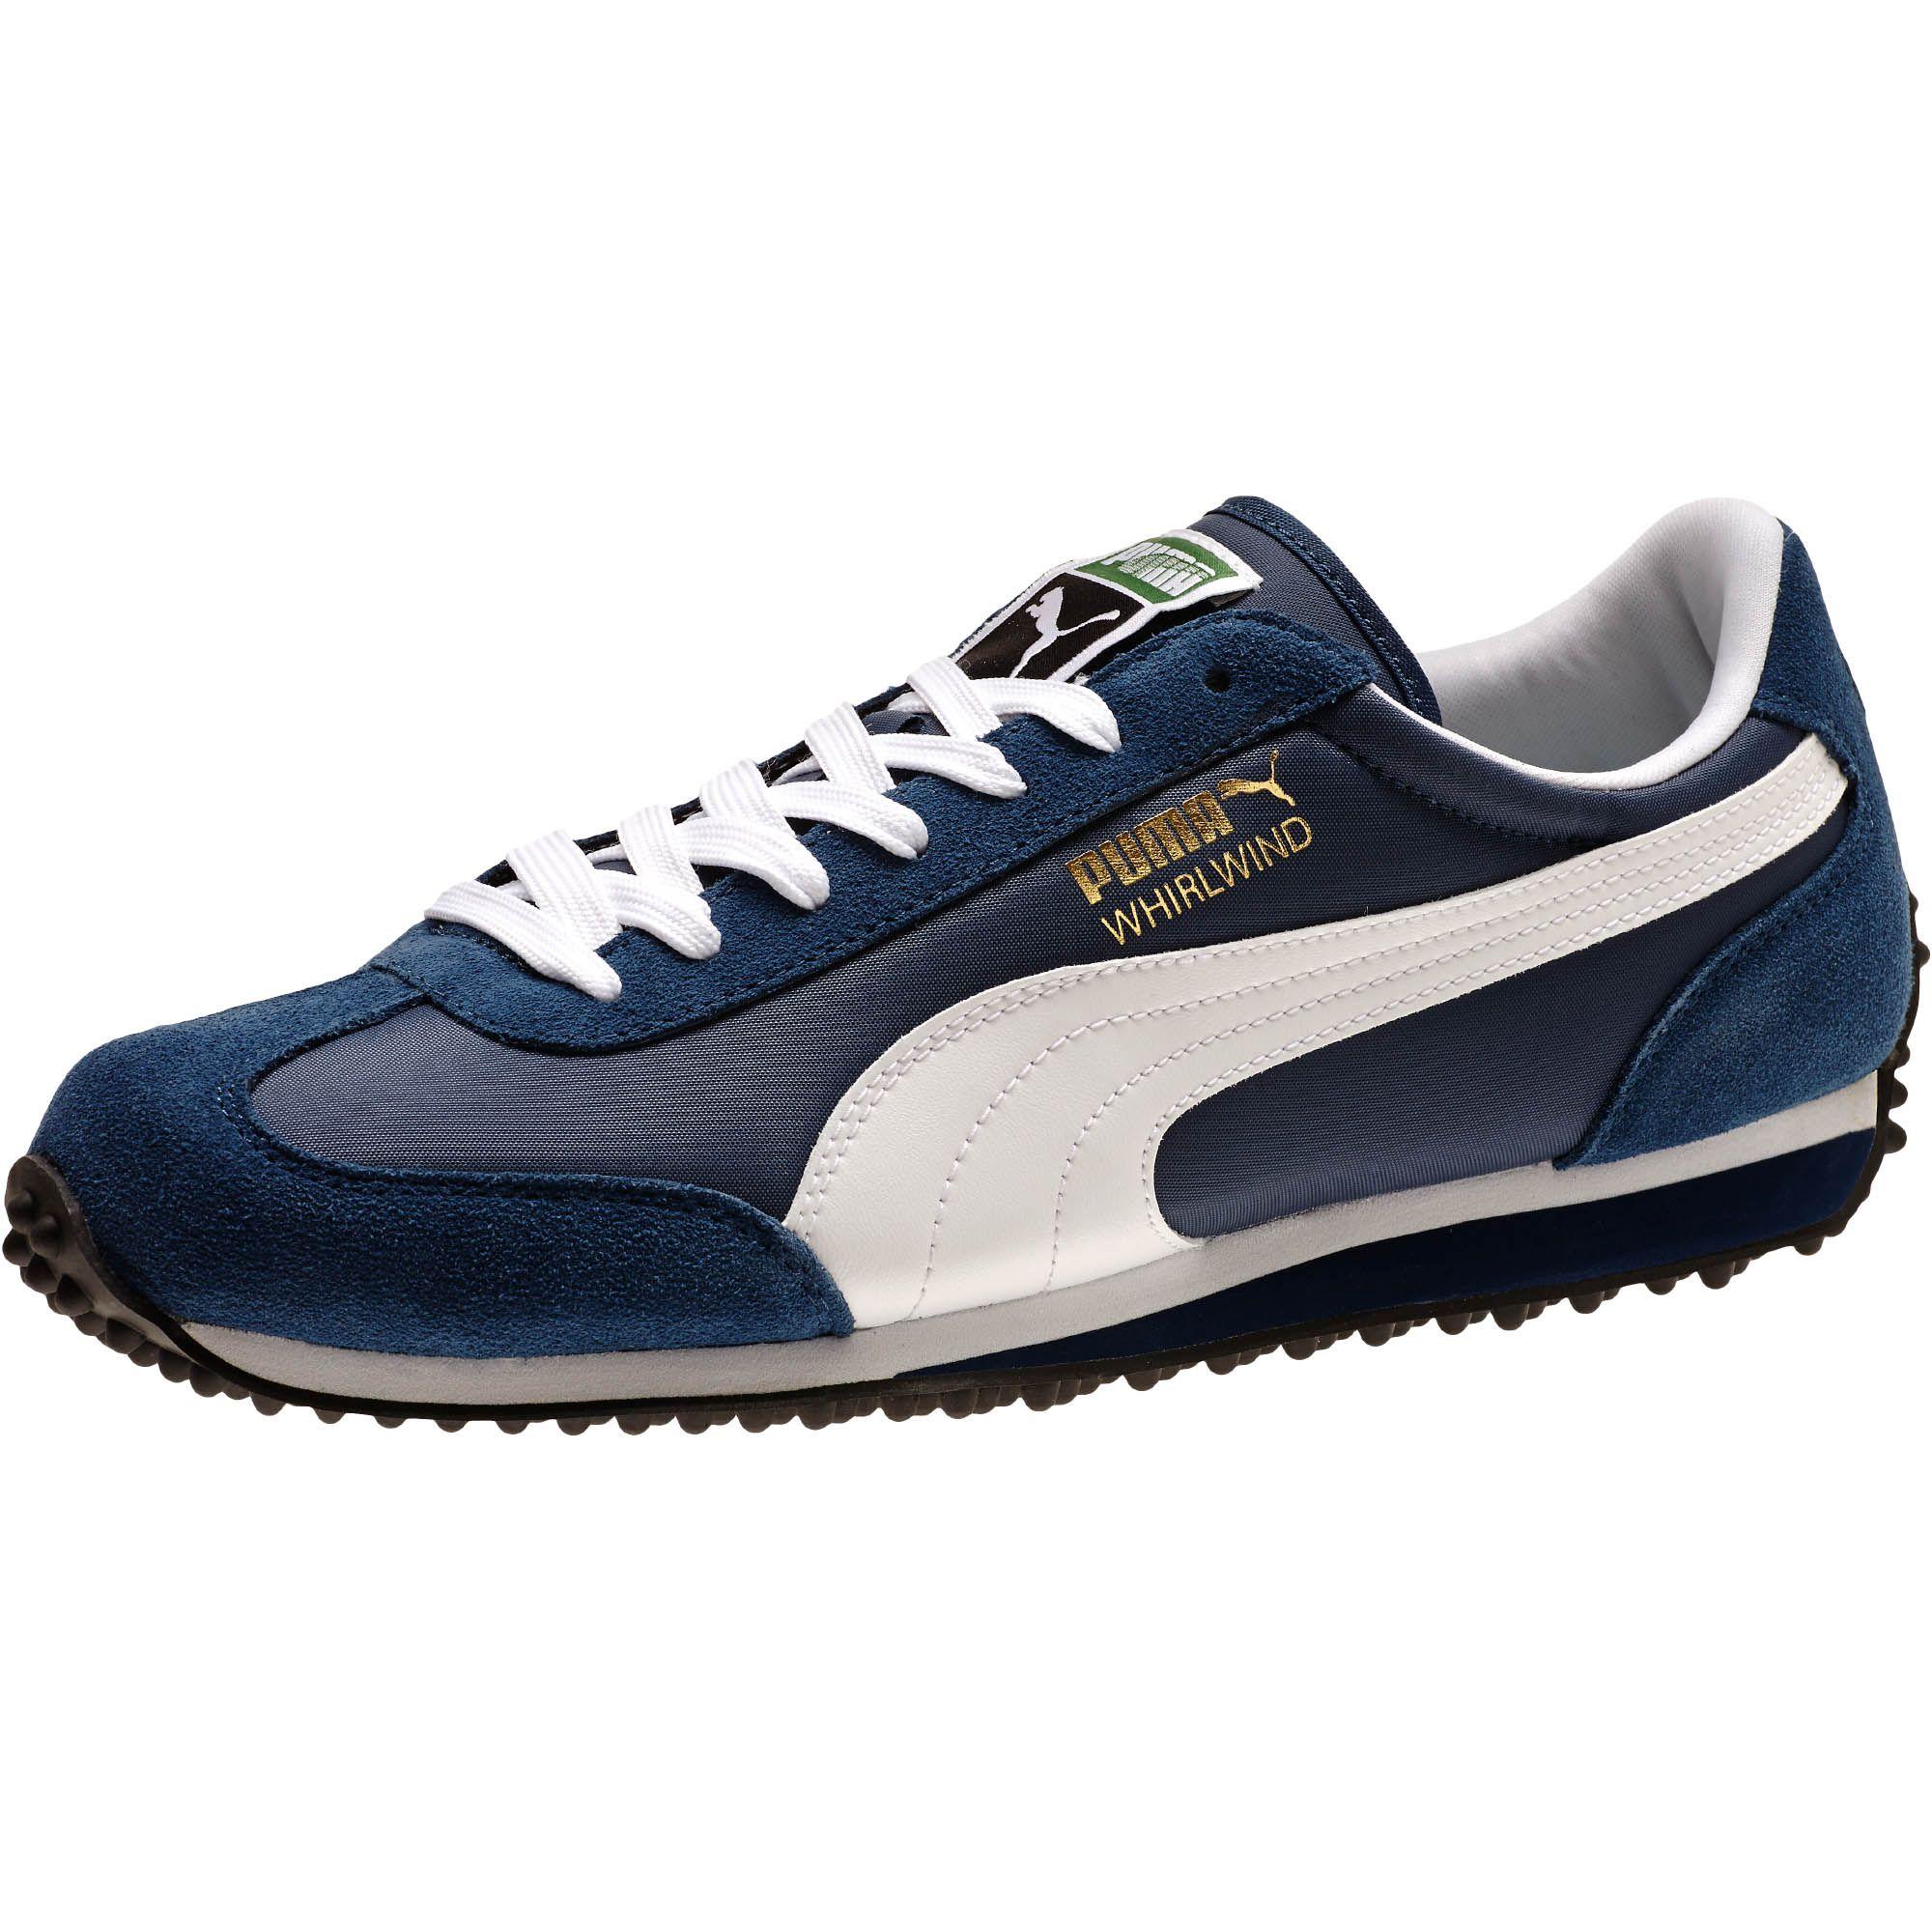 Puma whirlwind puma-whirlwind-classic-men-039-s-sneakers ZTOWXDV